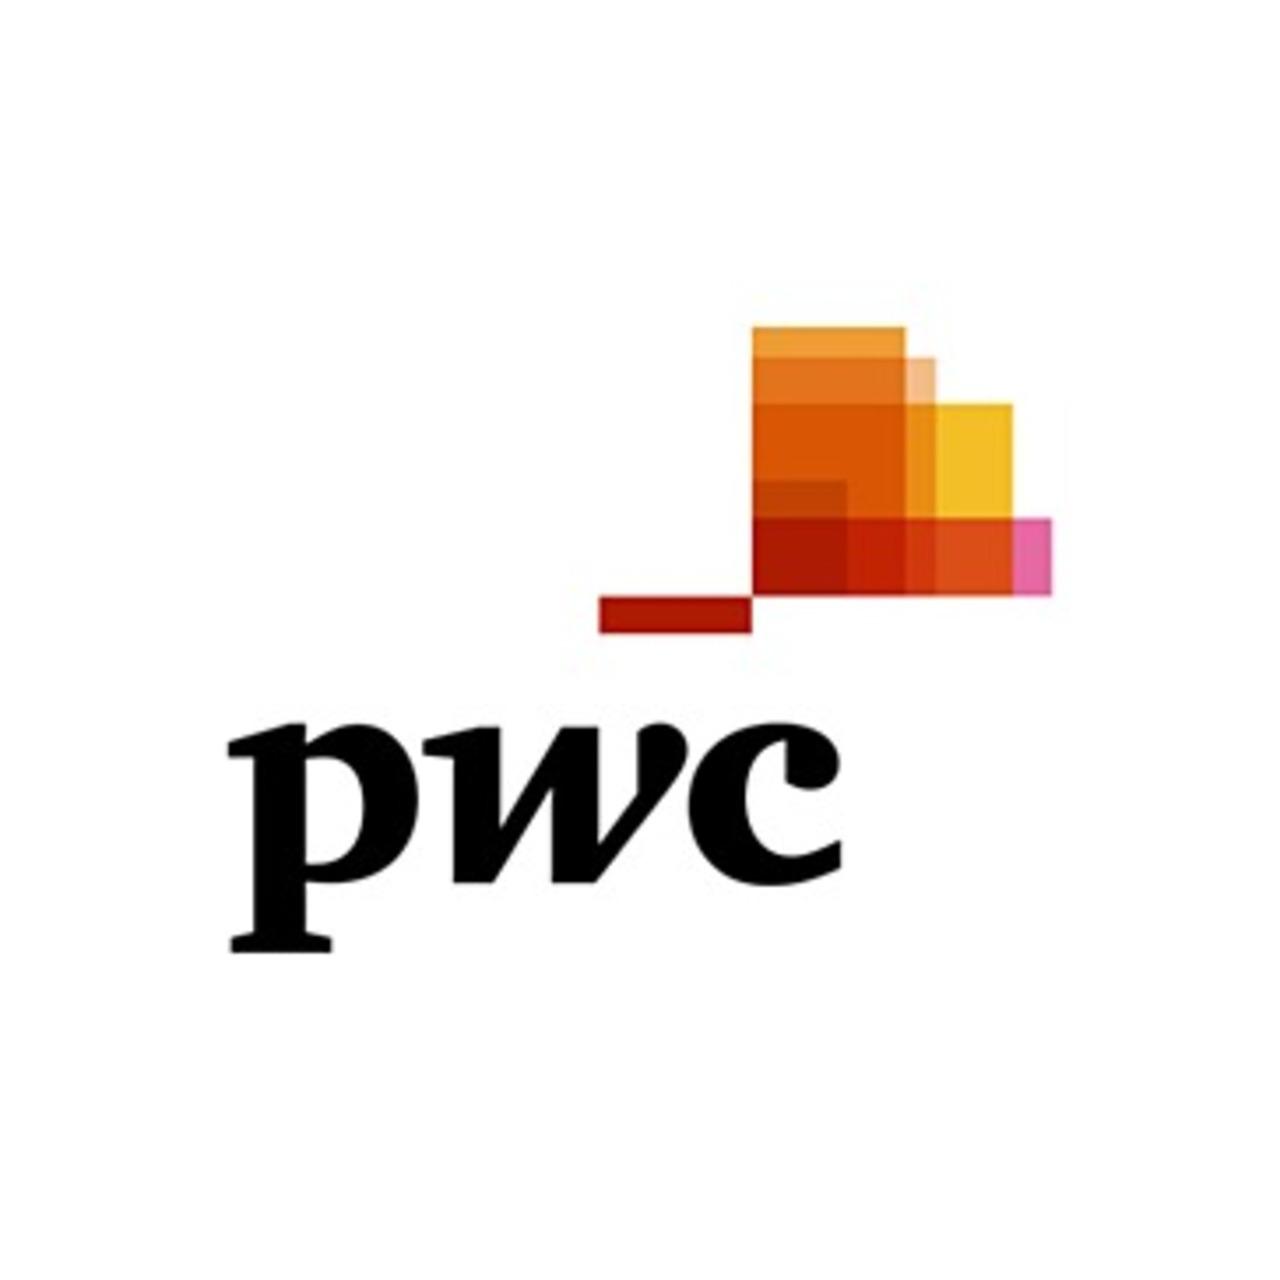 PwC NYM PCS